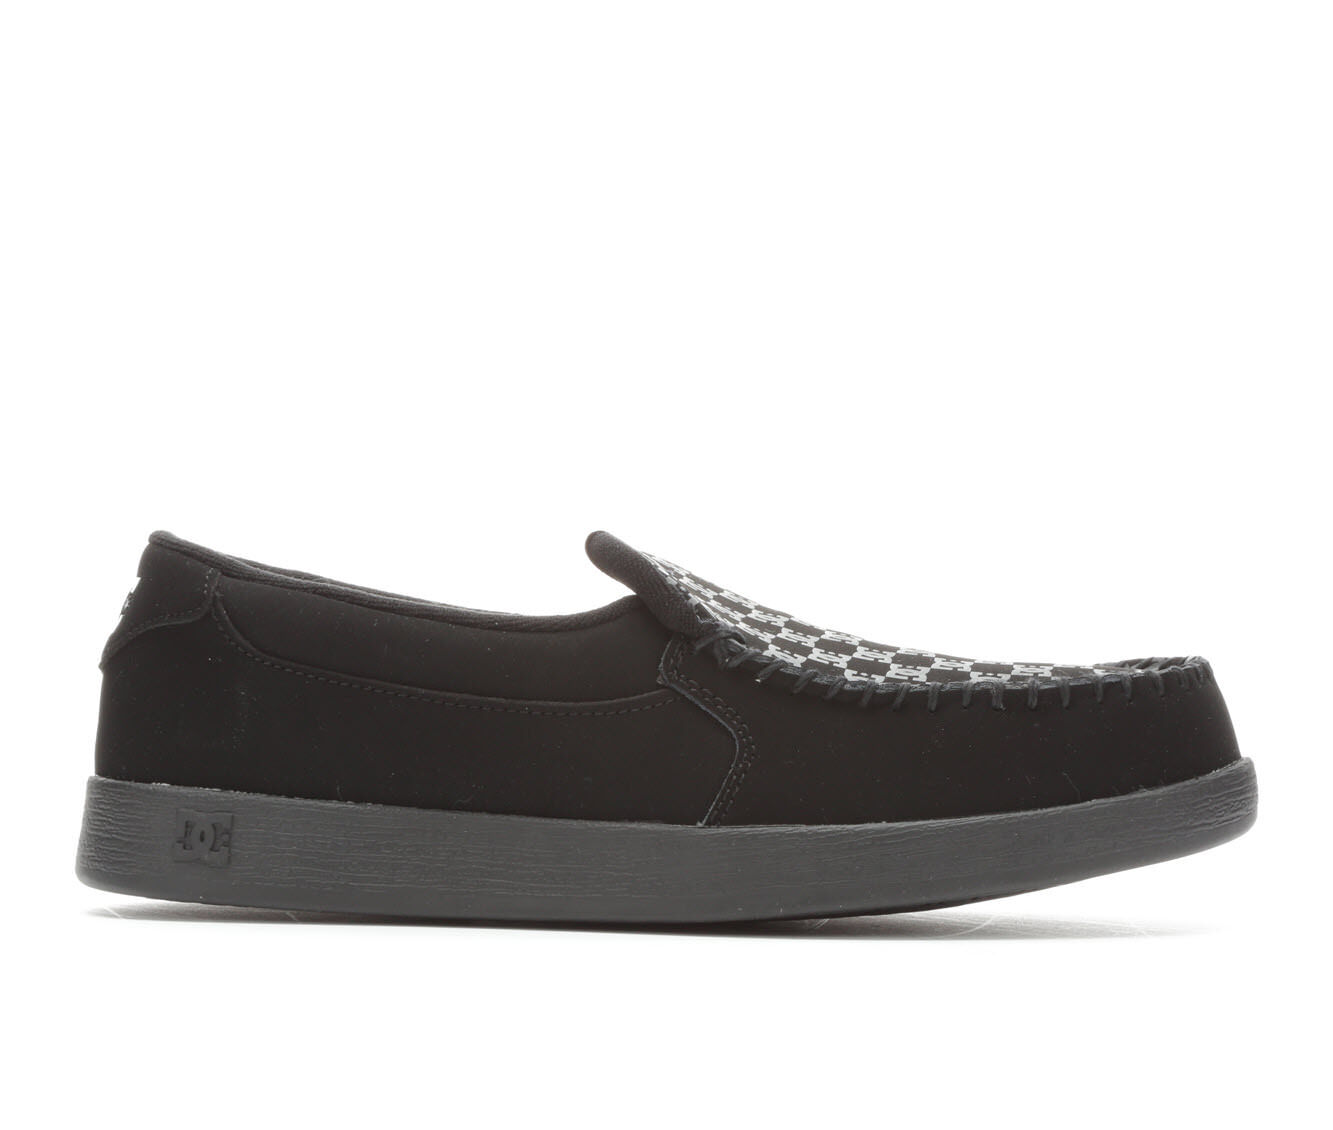 uk shoes_kd1422